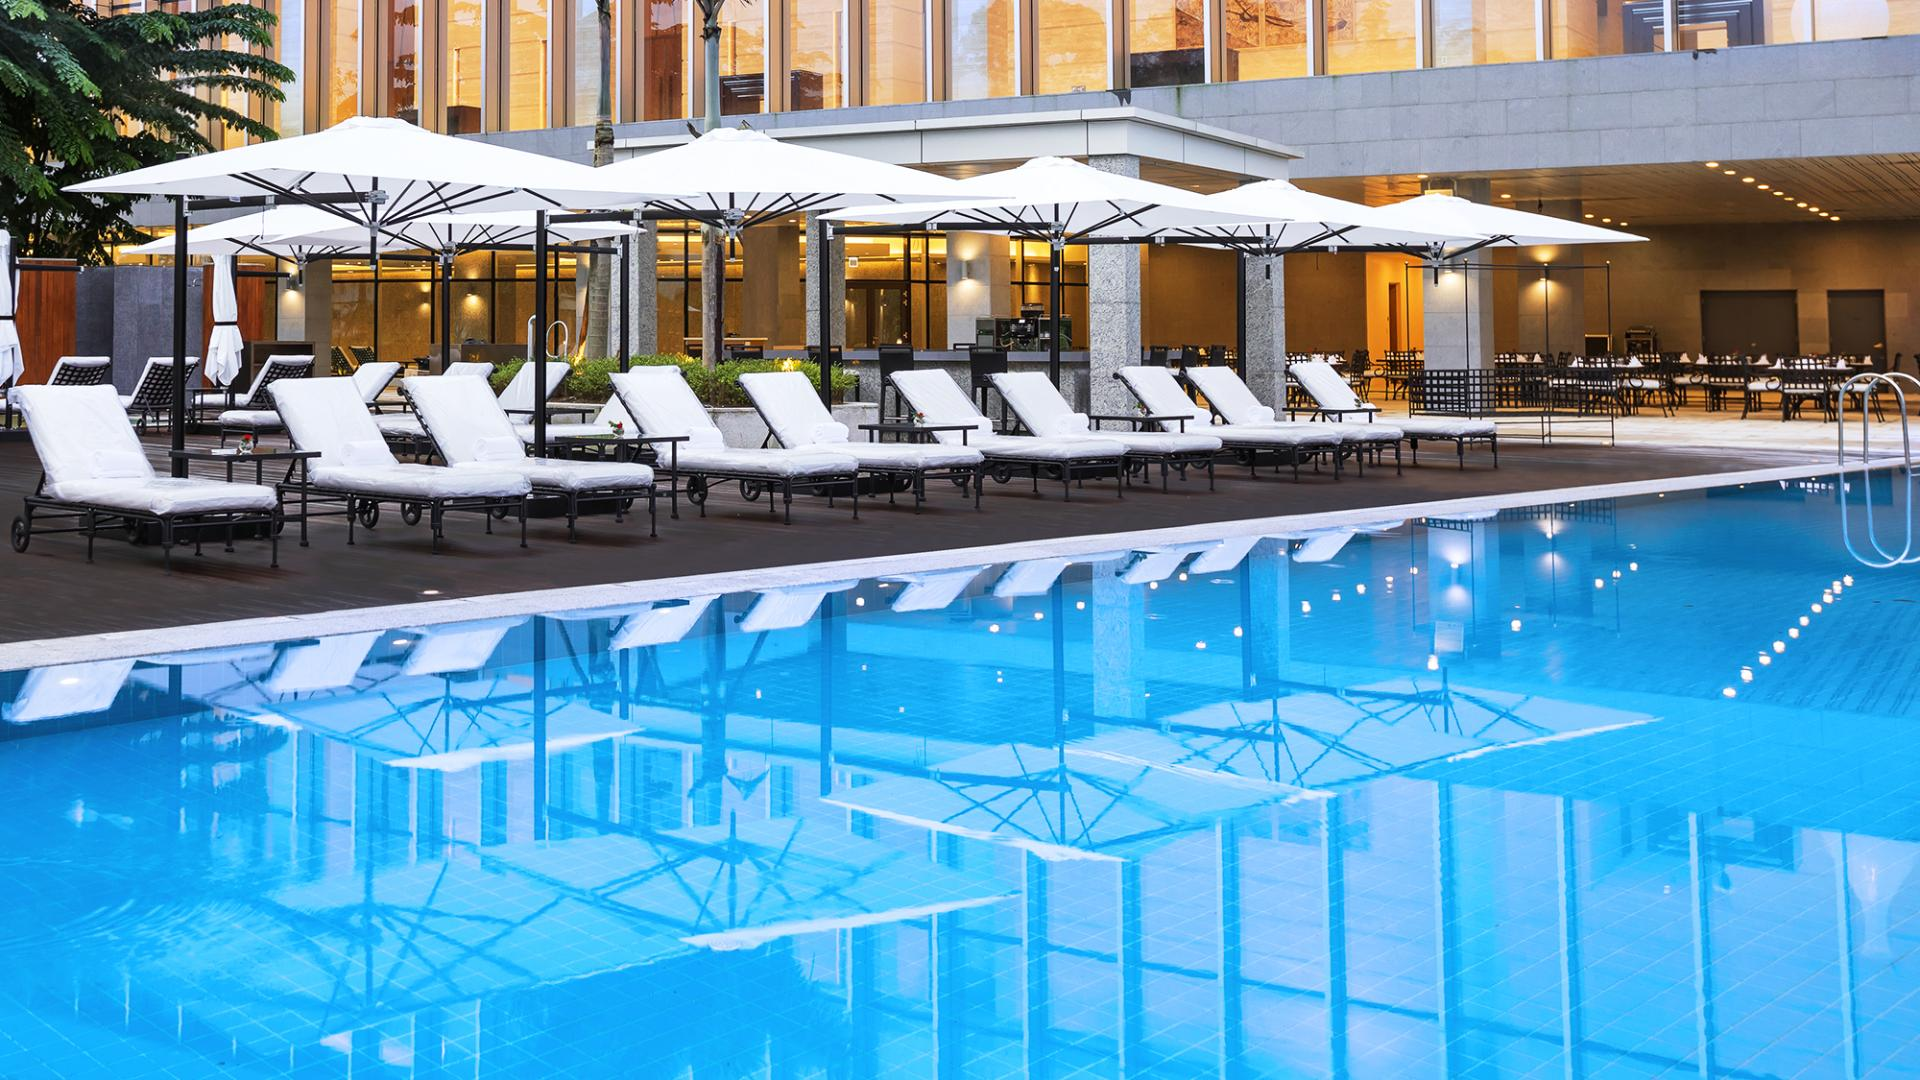 Infinity Pool - Hotel Outdoor Swimming Pool | LOTTE Hotel Yangon